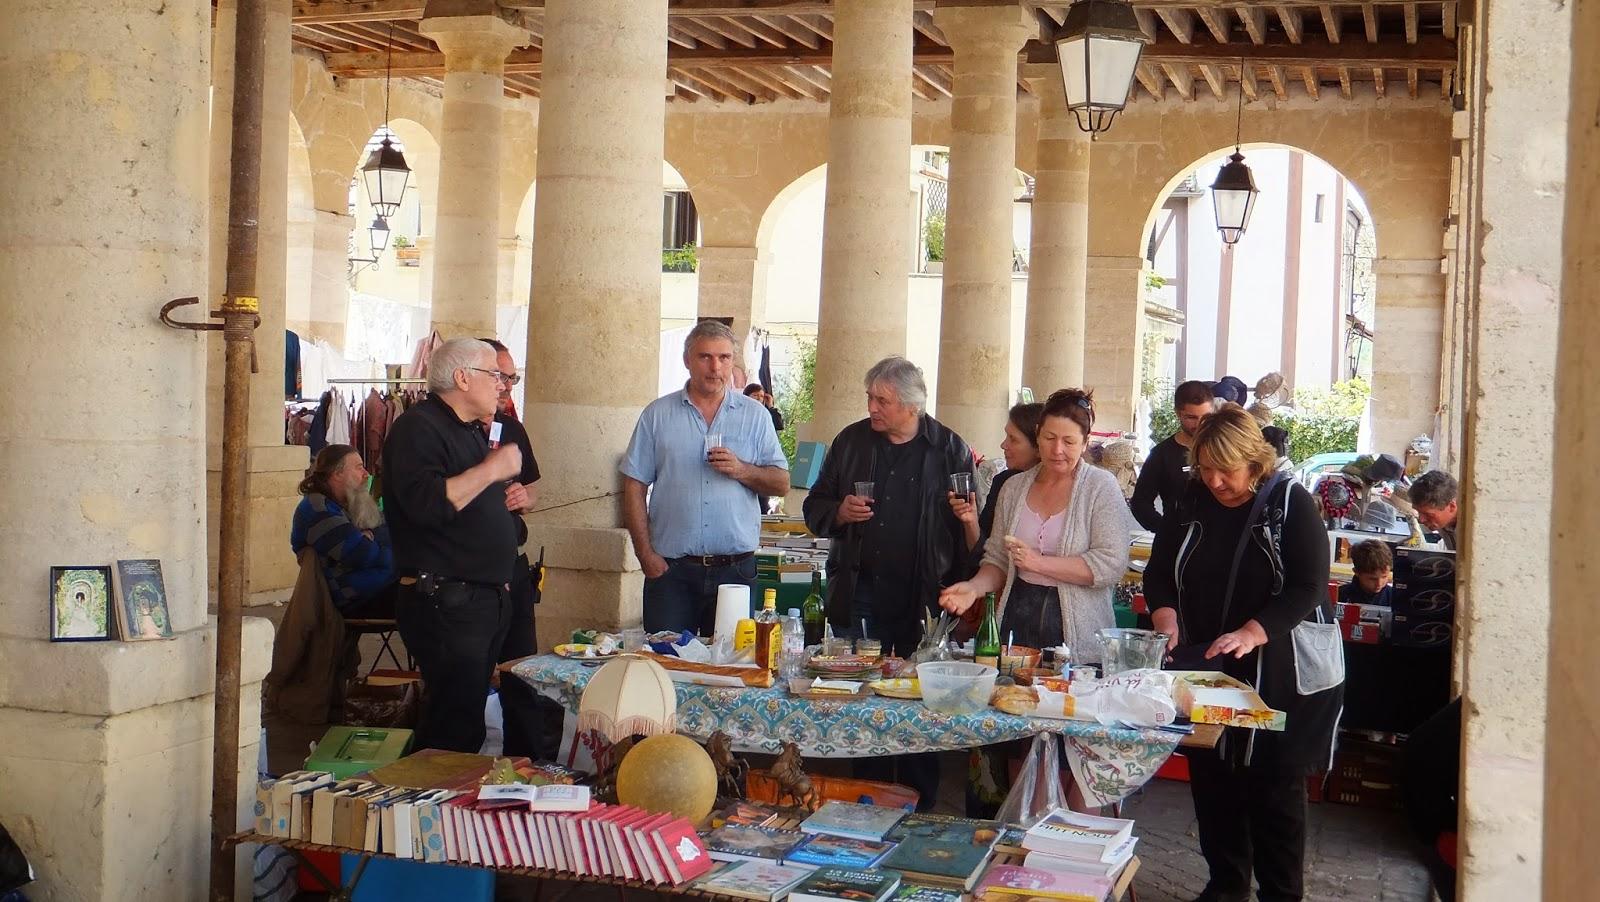 La Roche Guyon, Francia, Elisa N, Blog de Viajes Argentina, Lifestyle